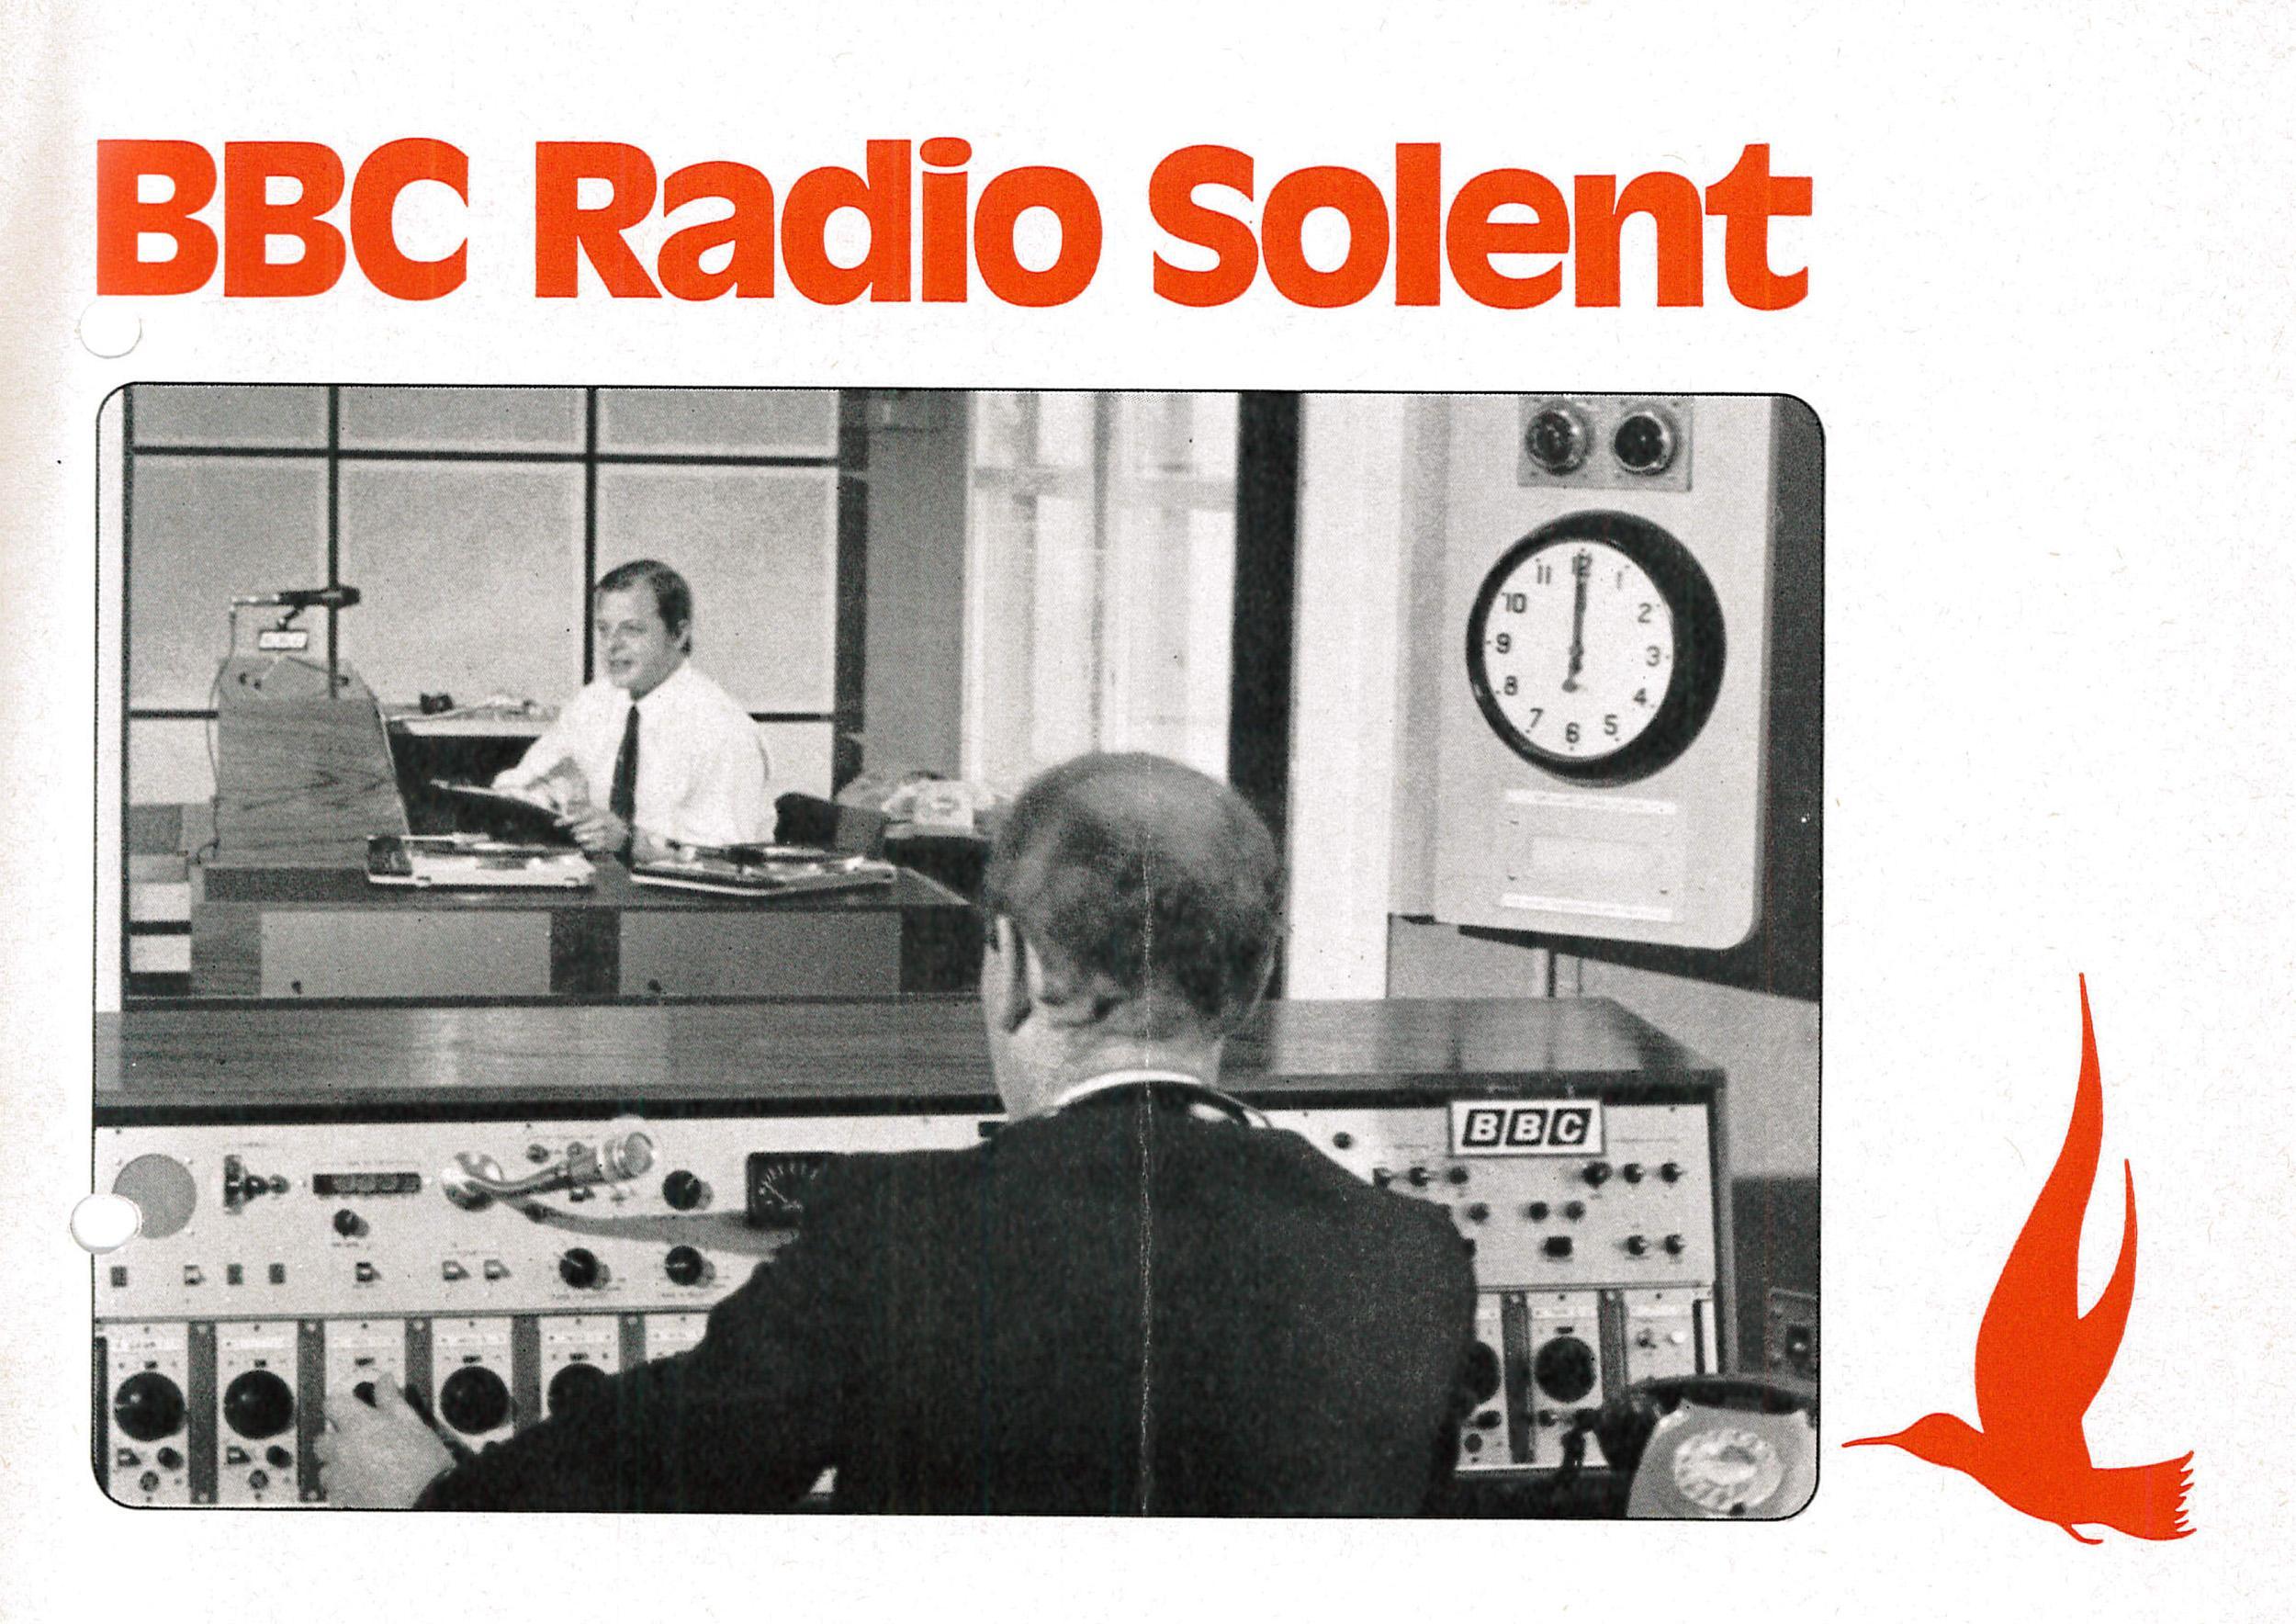 19710201 BBC Radio Solent leaflet 01.jpg